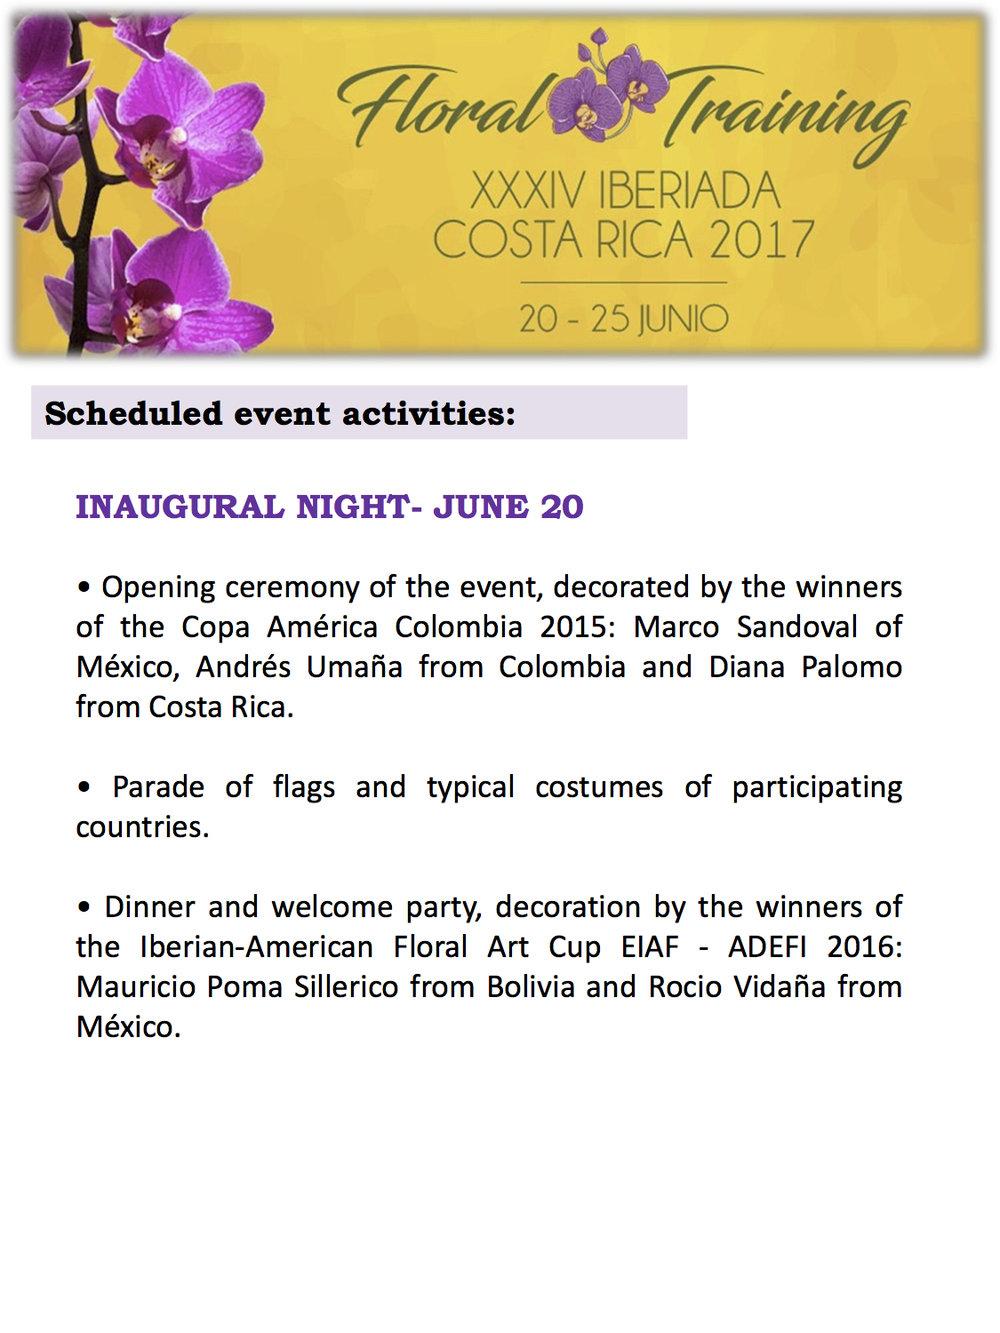 Floral Training - XXXIV Iberiada Costa Rica 2017 (English) 6.jpg